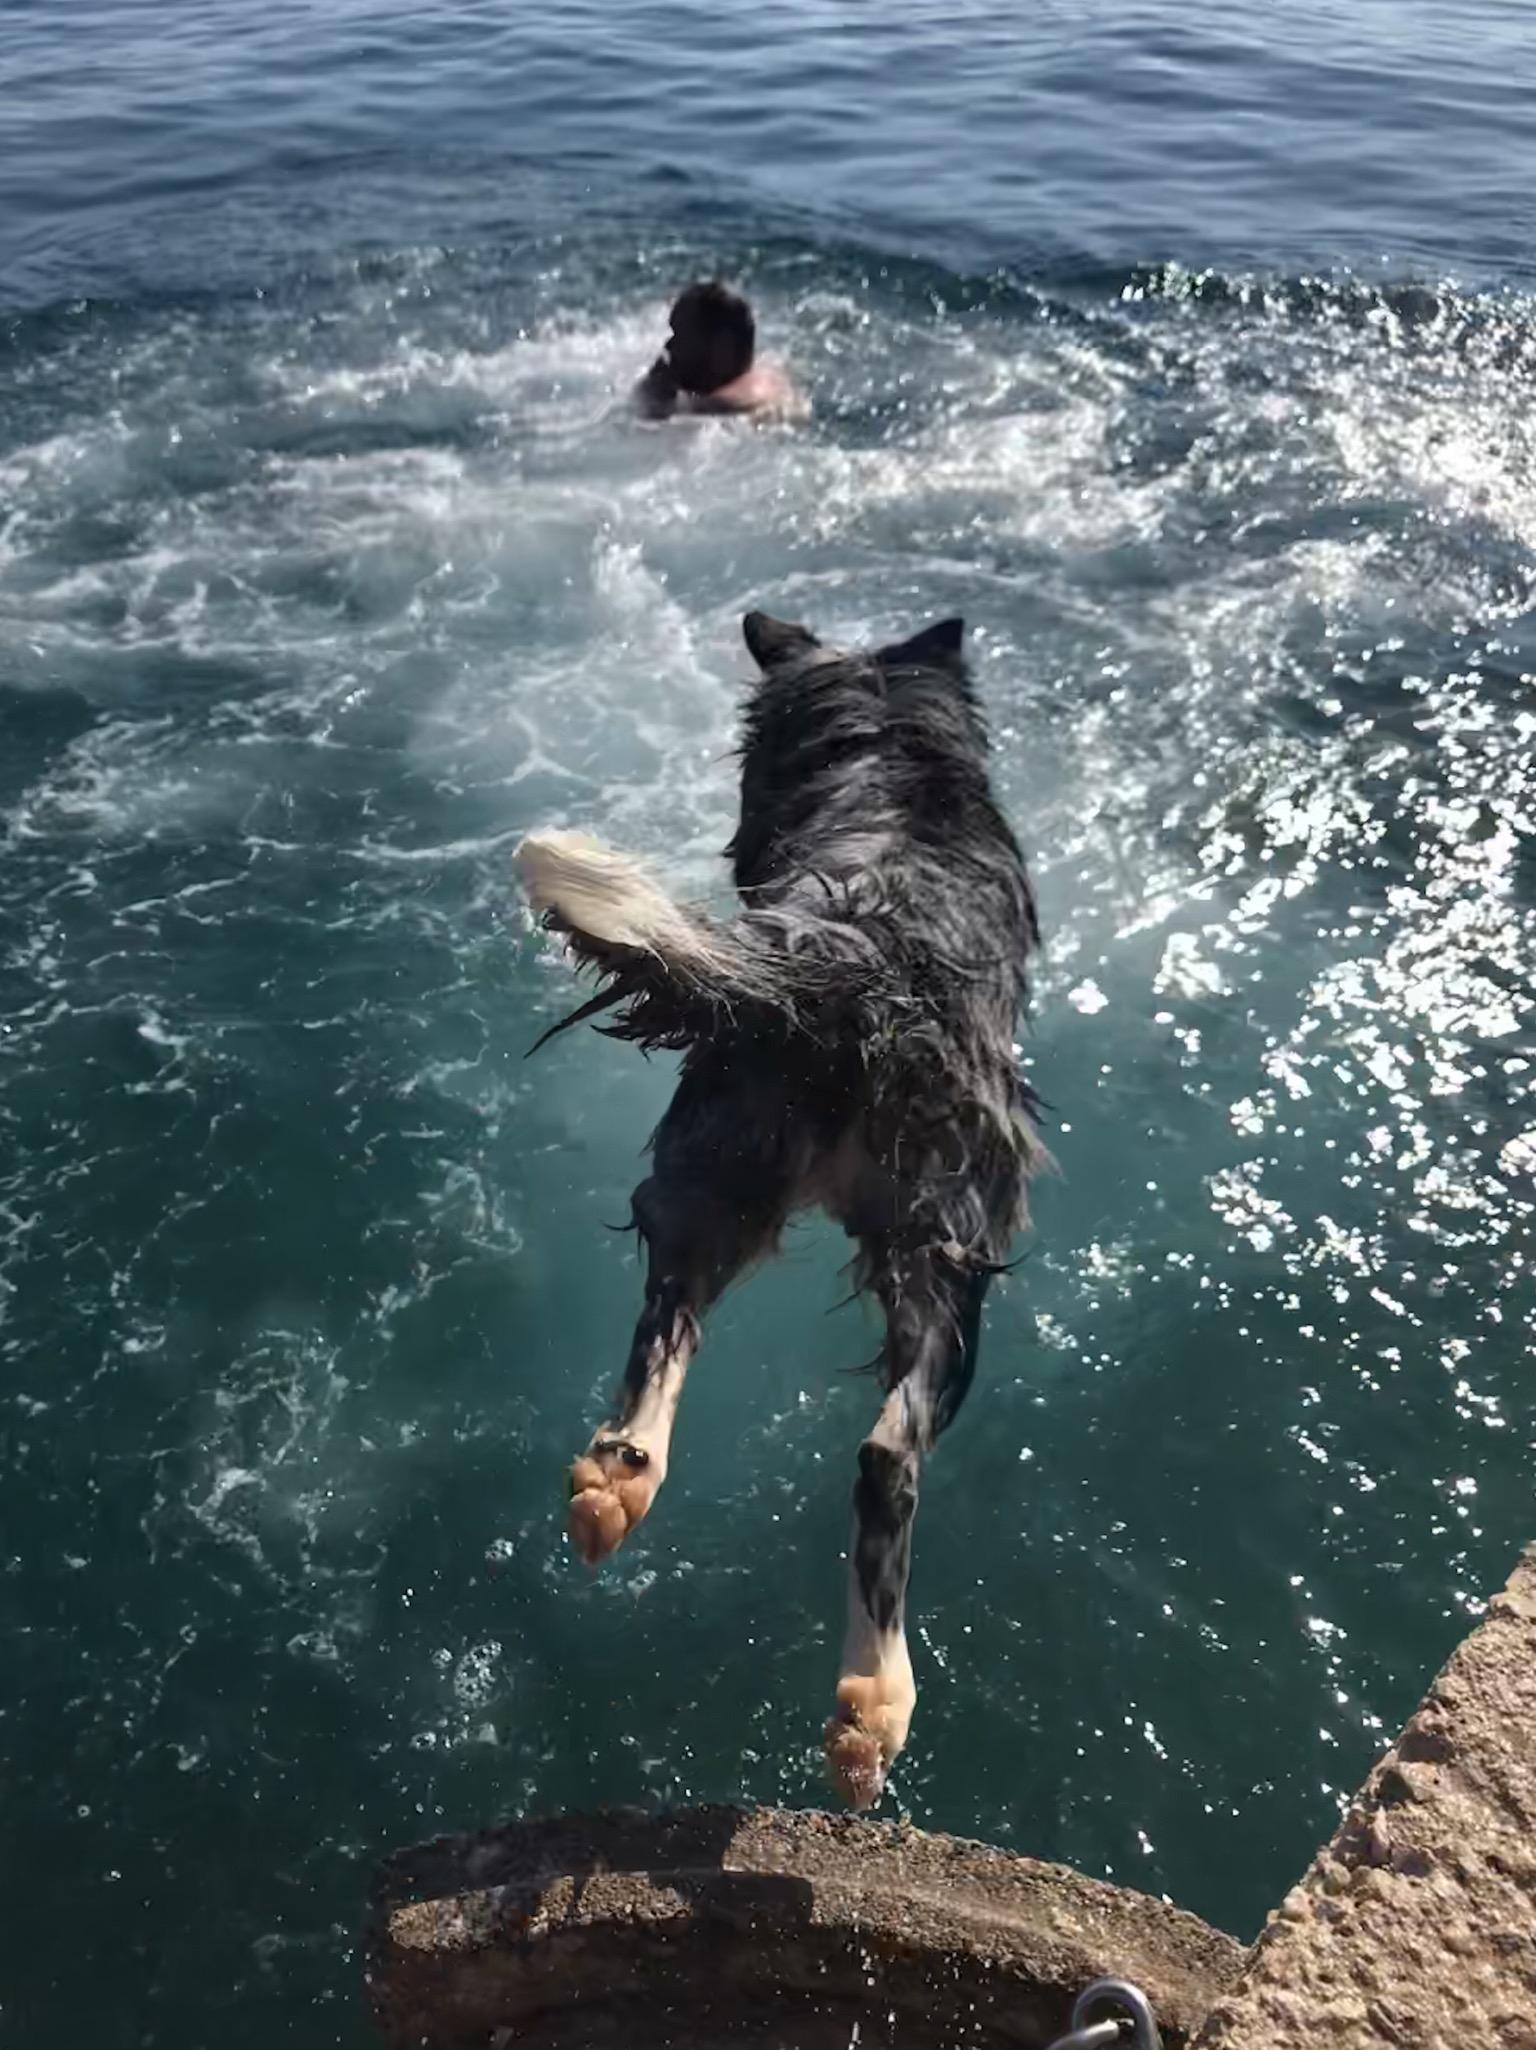 Kamri springt ins Wasser